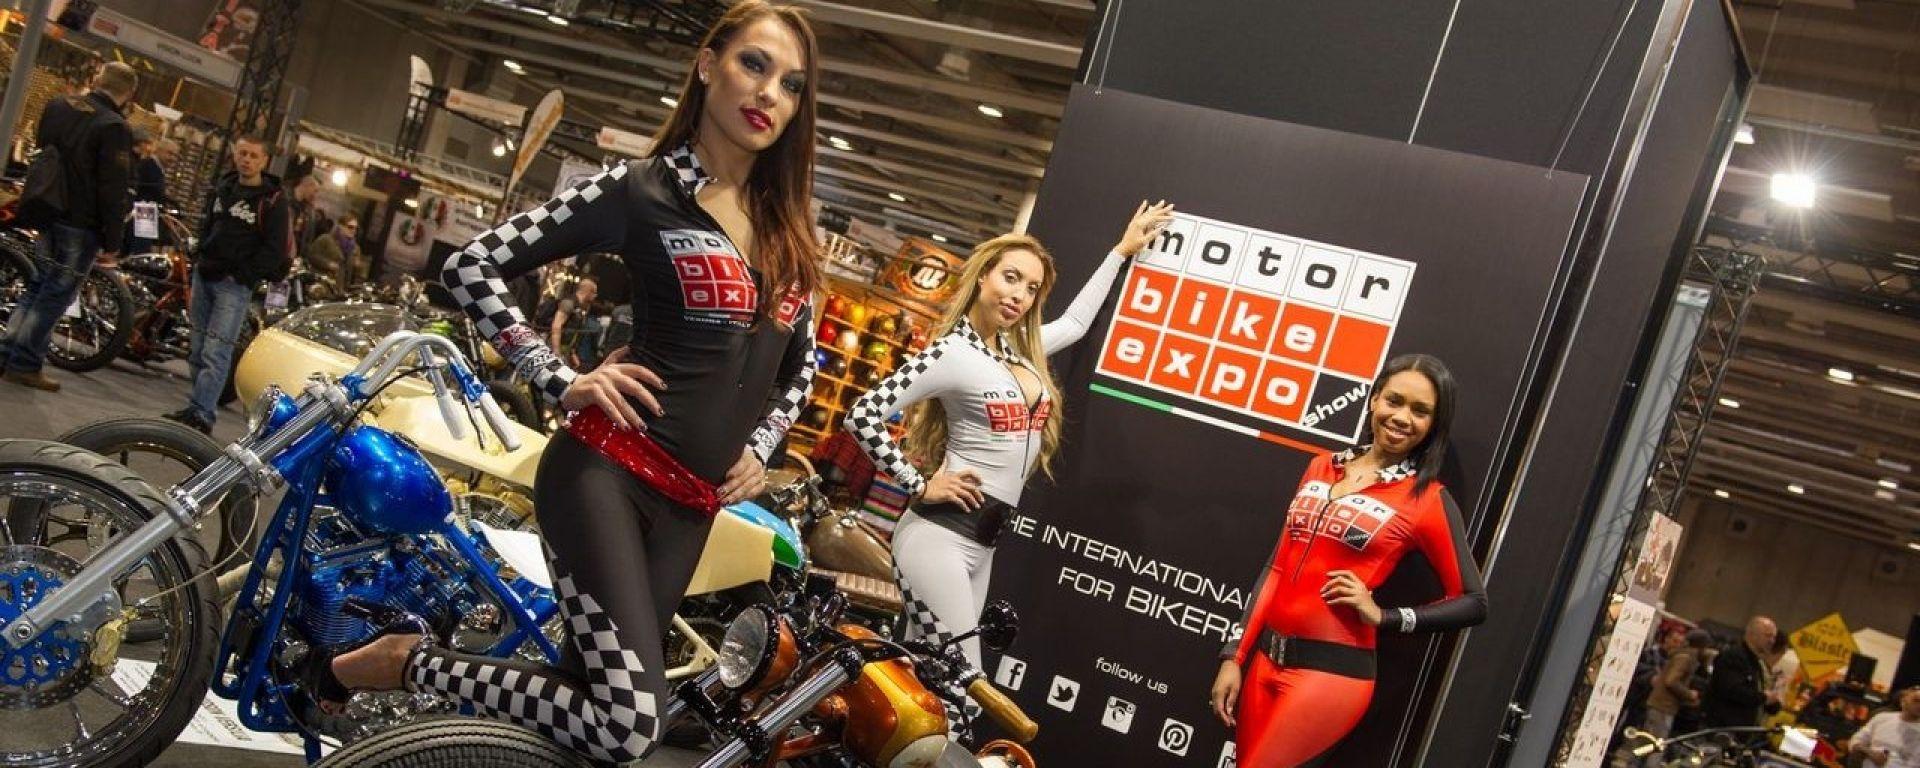 Motor Bike Expo Veronafiere